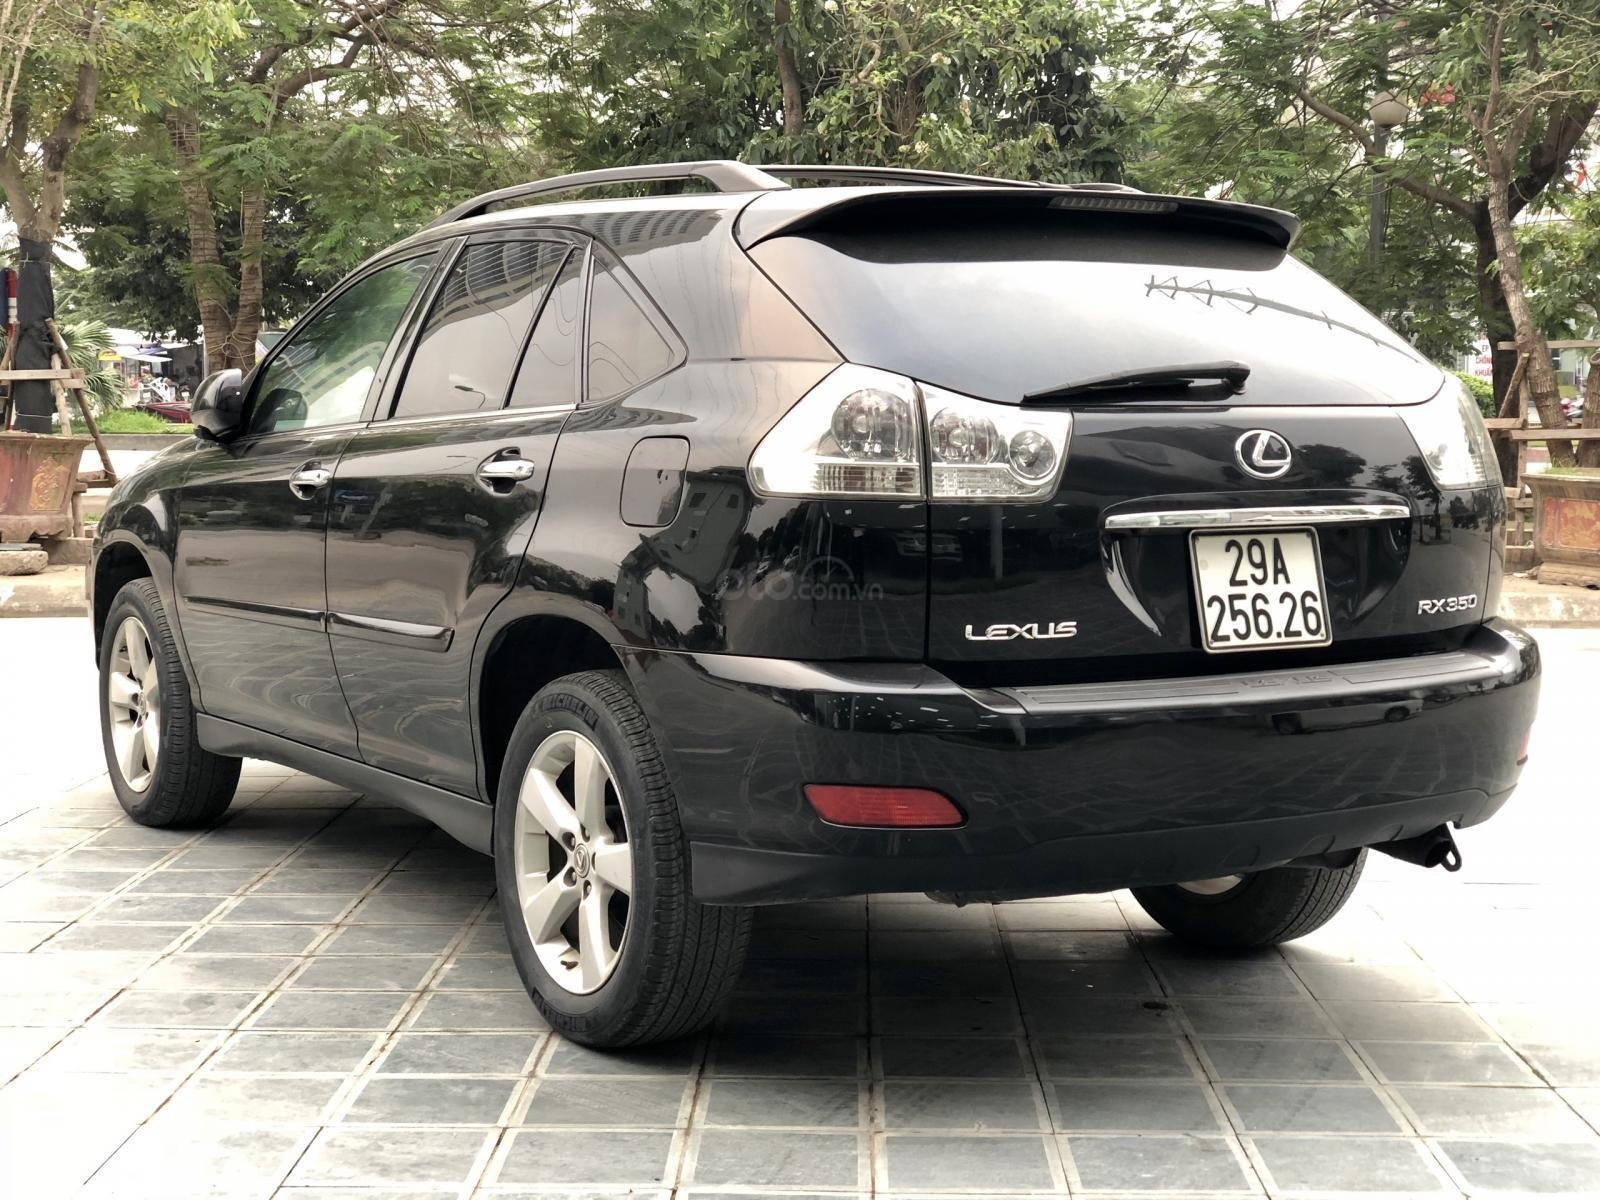 MT Auto bán Lexus RX 350 năm 2007, màu đen, xe nhập khẩu. LH em Hương 0945392468-3